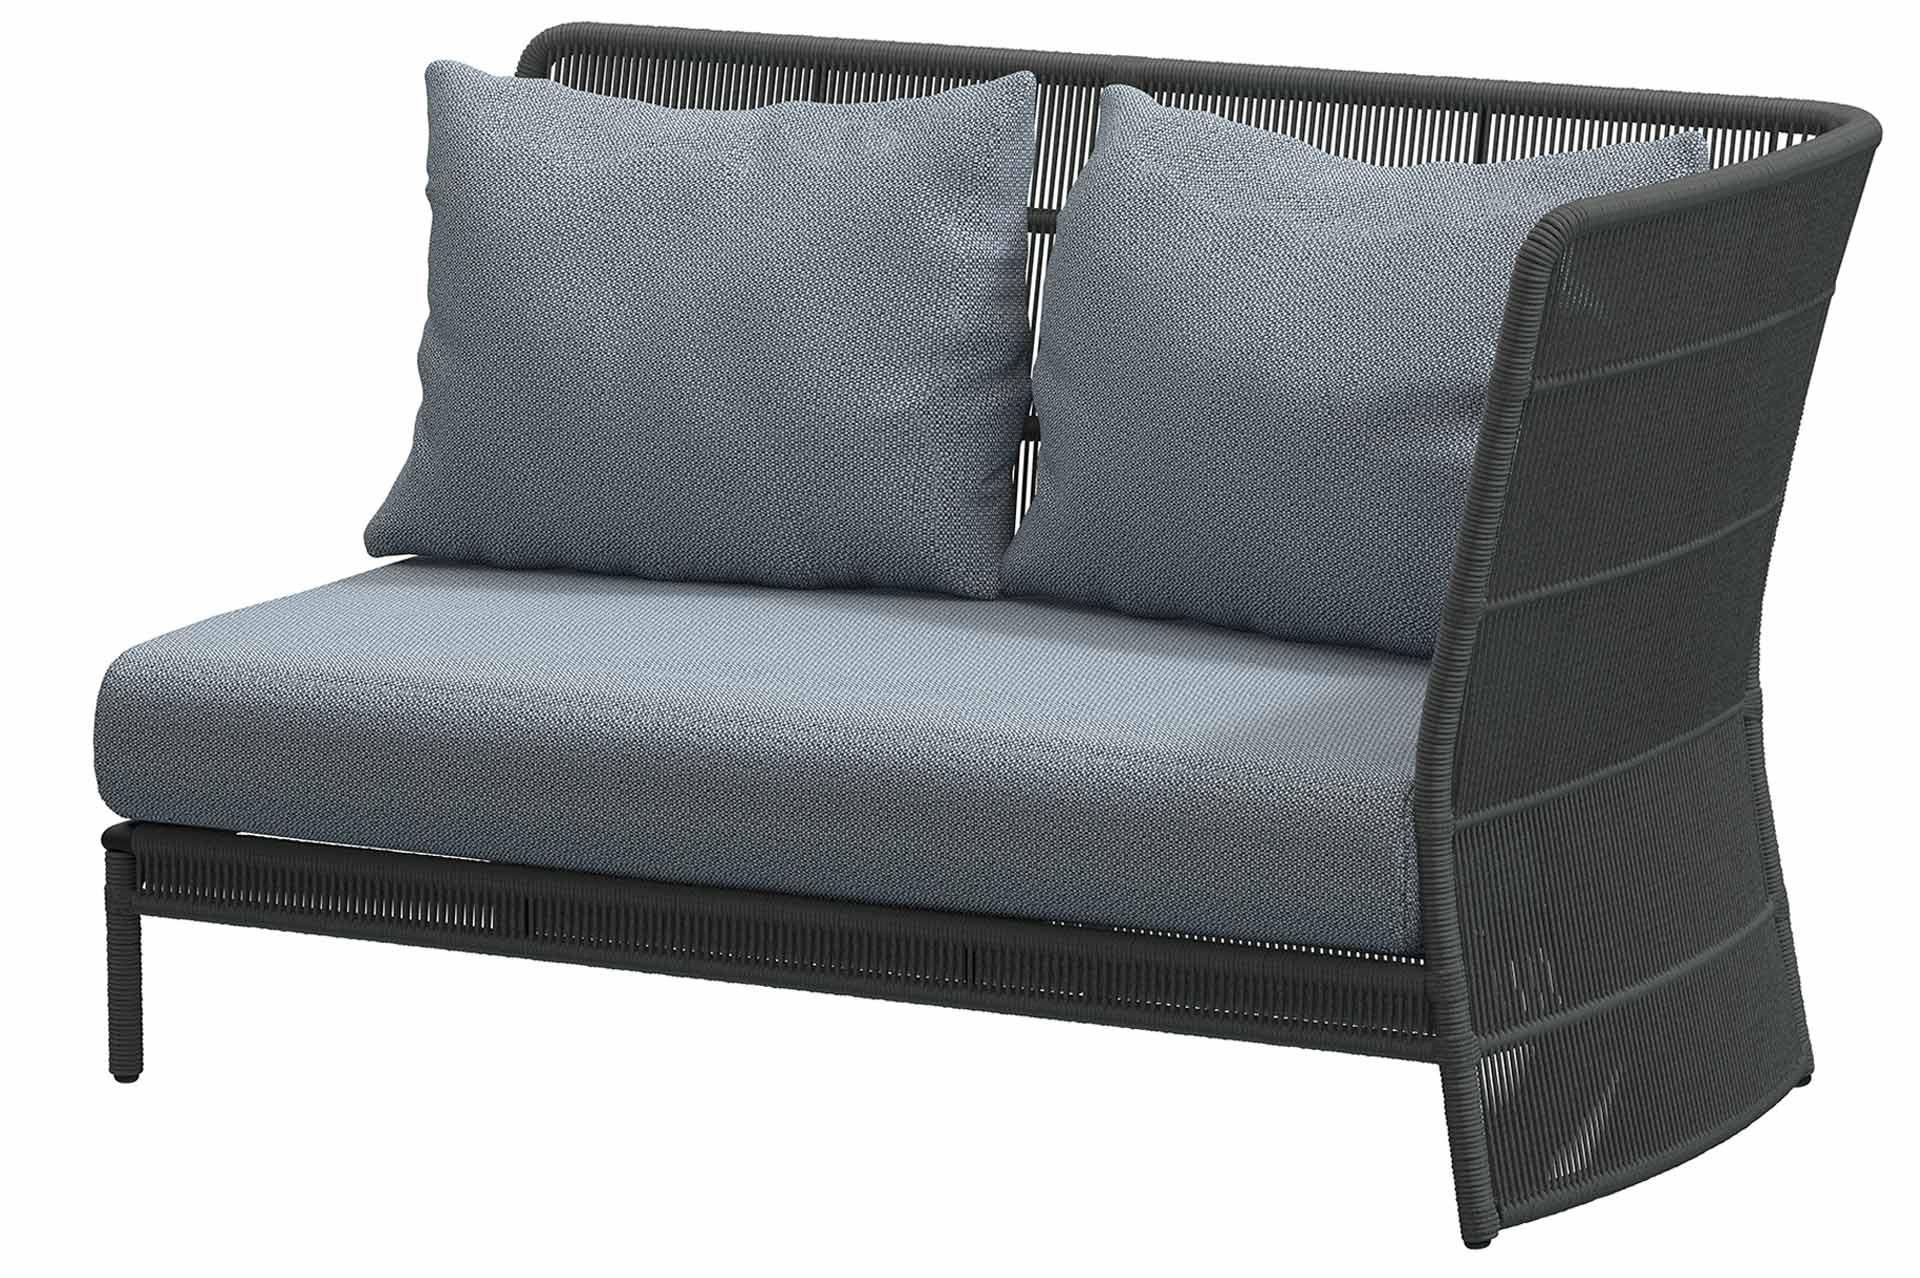 Oriënt Modular 2 seater left arm Platinum with 3 cushions